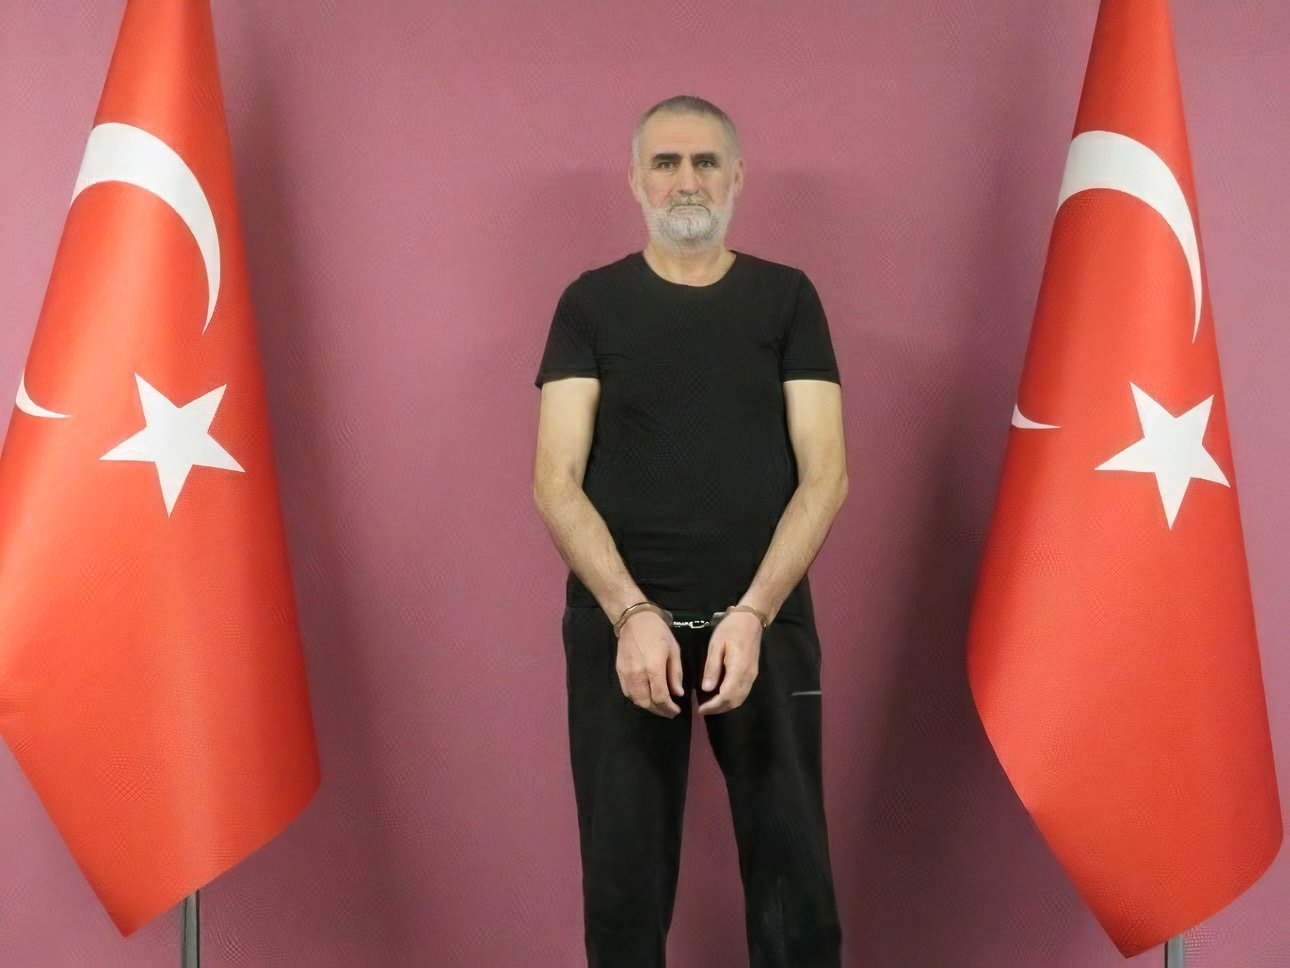 Senior Daesh terrorist Kasım Güler poses in handcuffs after being detained by Turkish intelligence, unidentified location in Turkey, June 15, 2021. (AA Photo)